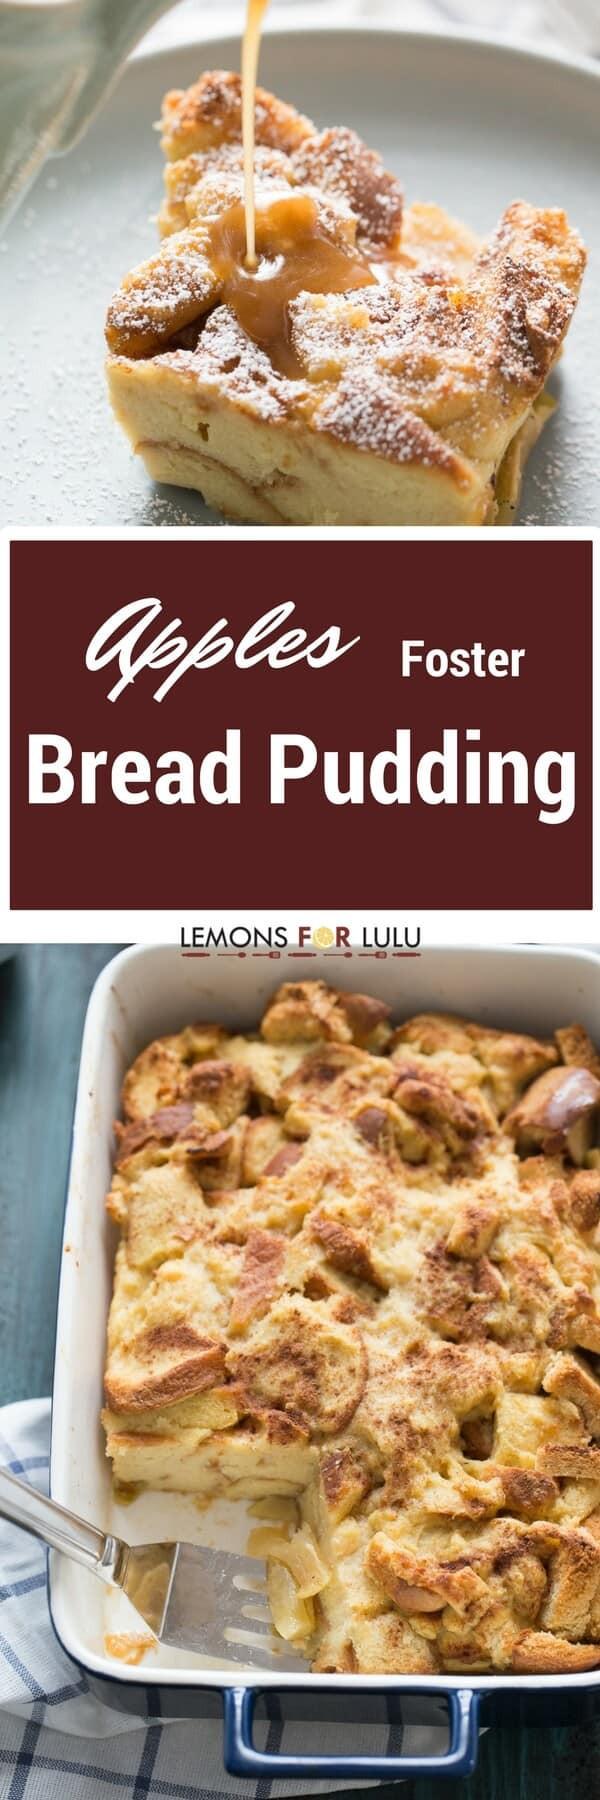 Easy Bread Pudding Recipe  Apples Foster Bread Pudding Recipe LemonsforLulu